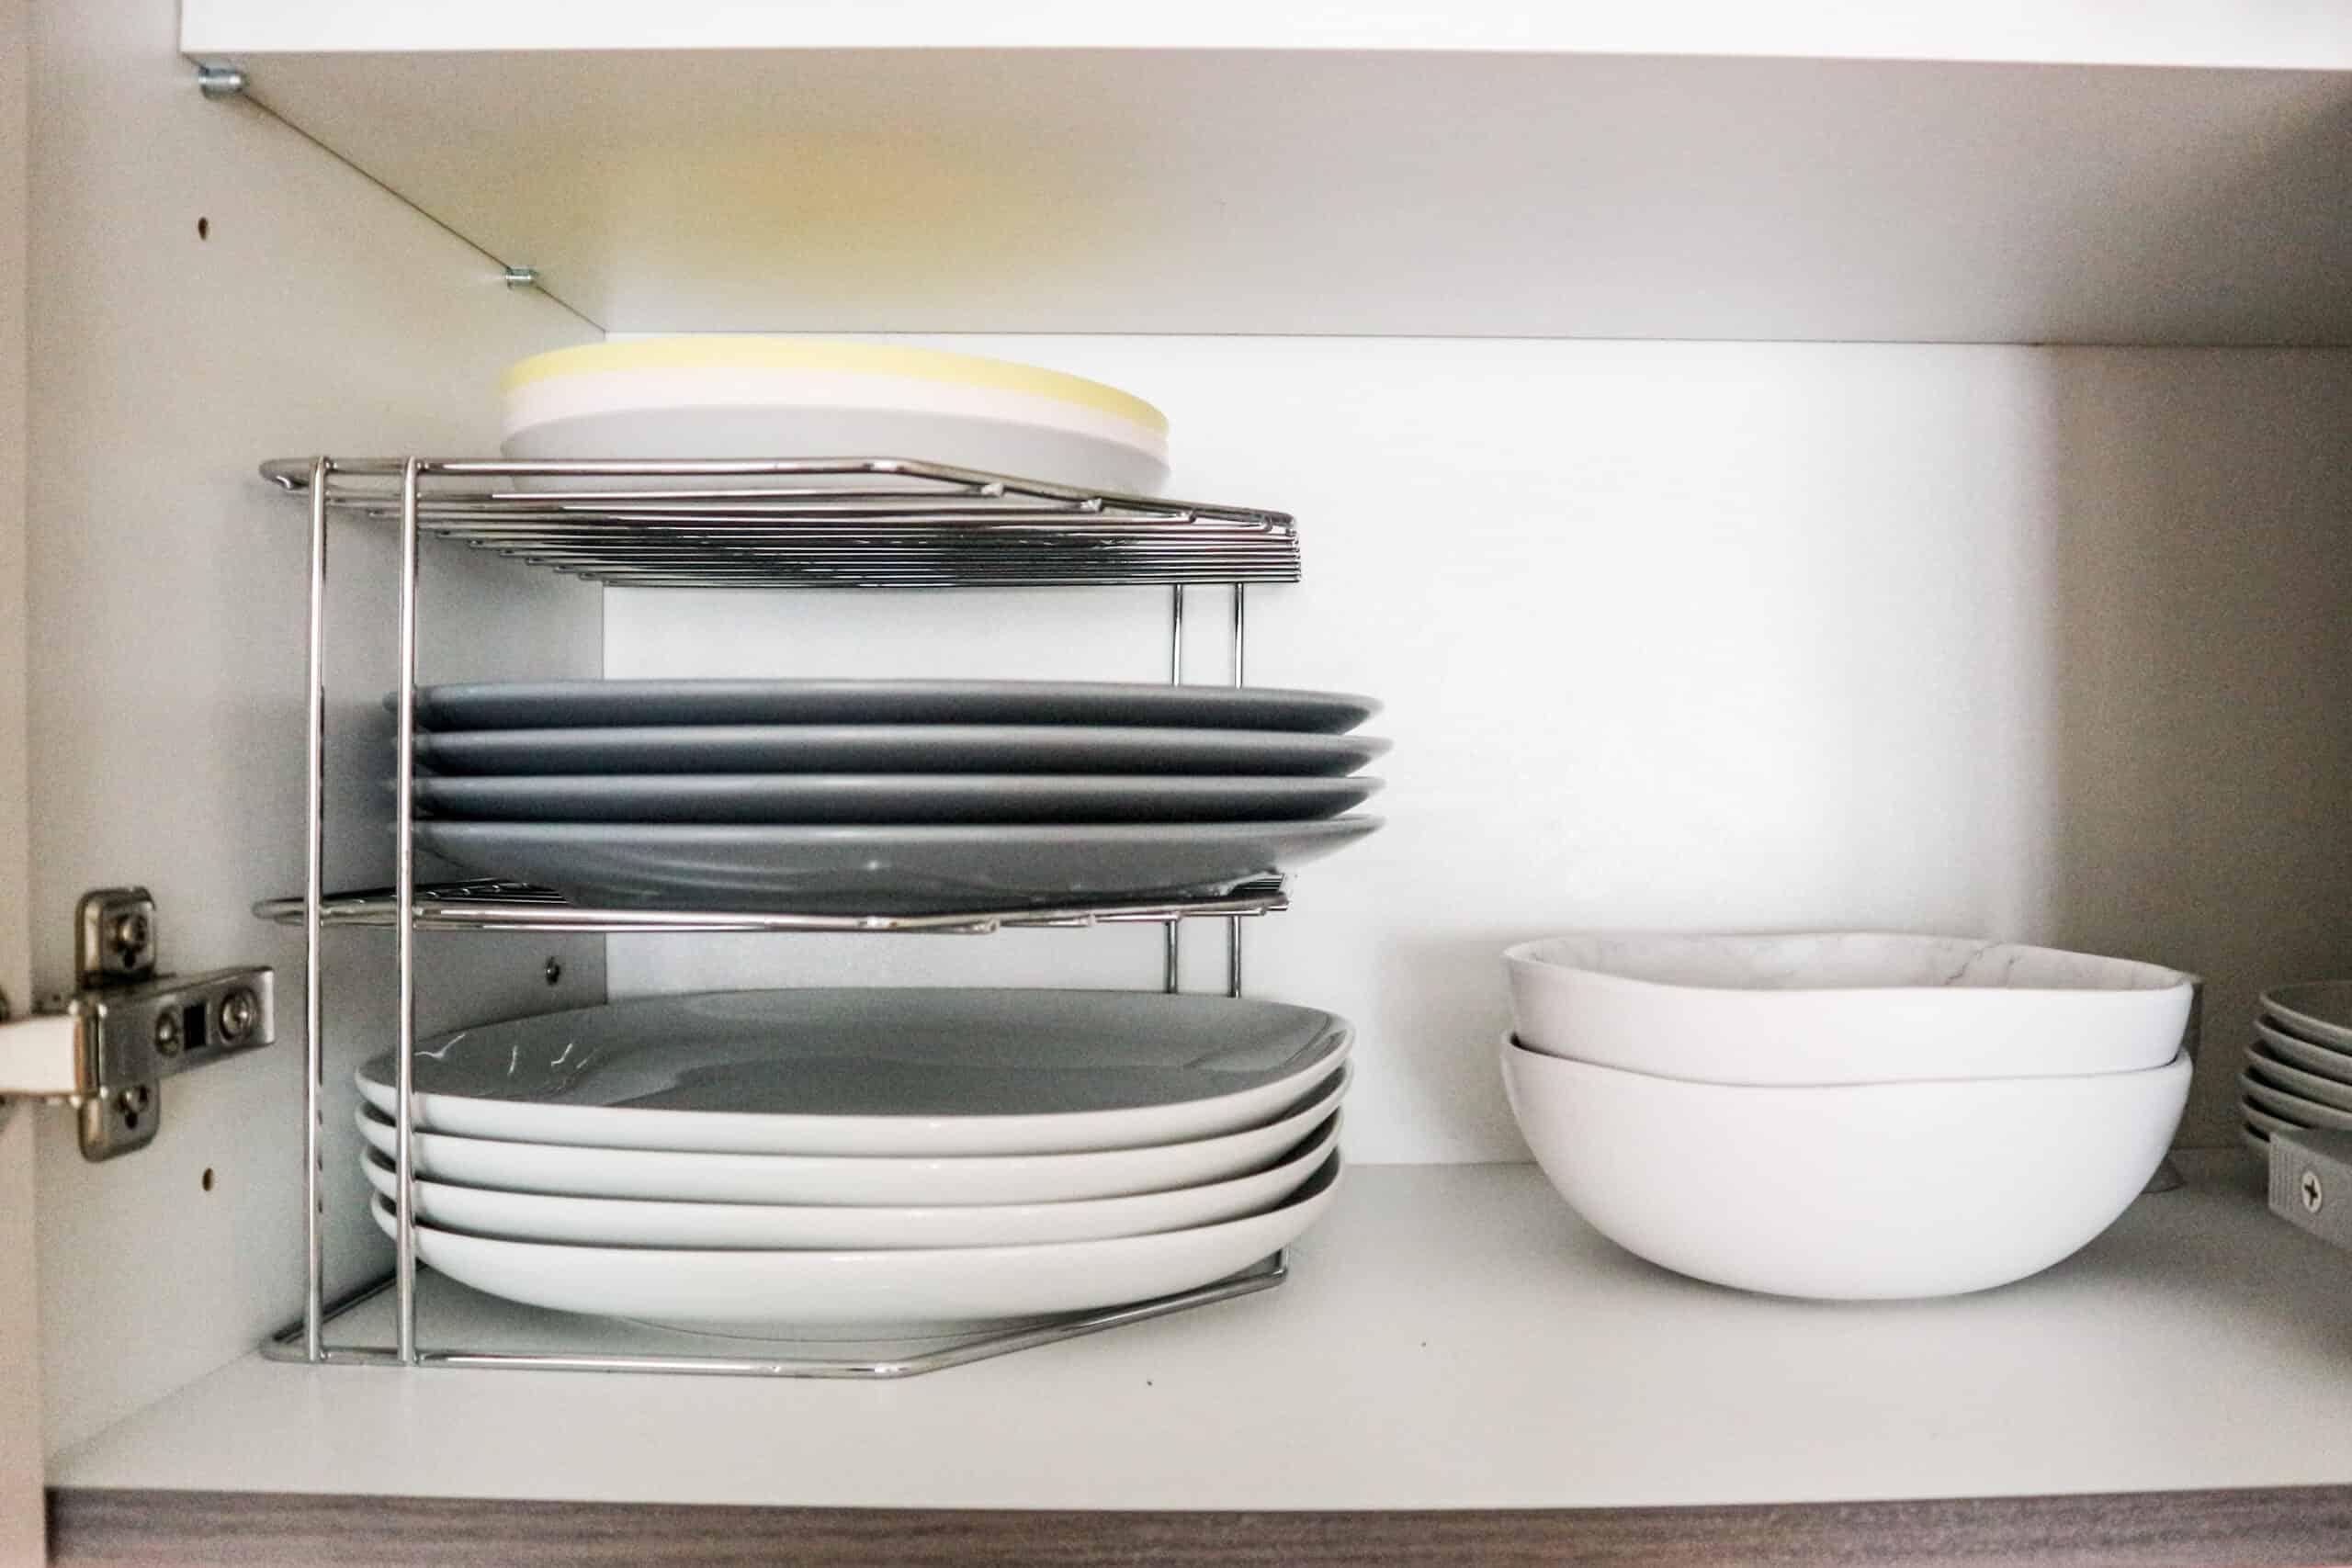 How to organize plates storage tips